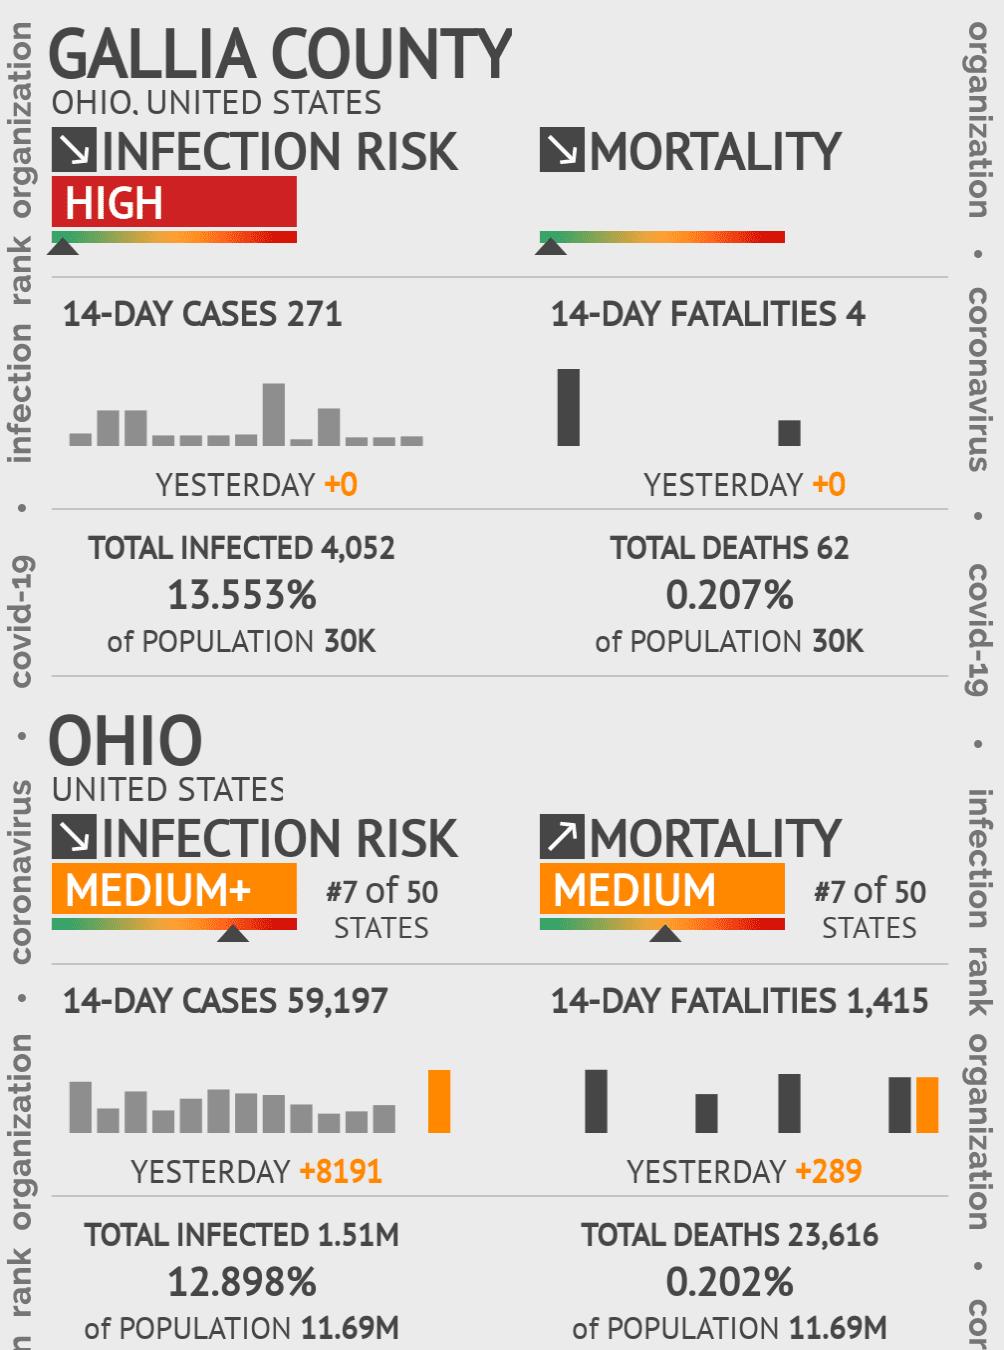 Gallia County Coronavirus Covid-19 Risk of Infection on July 24, 2021